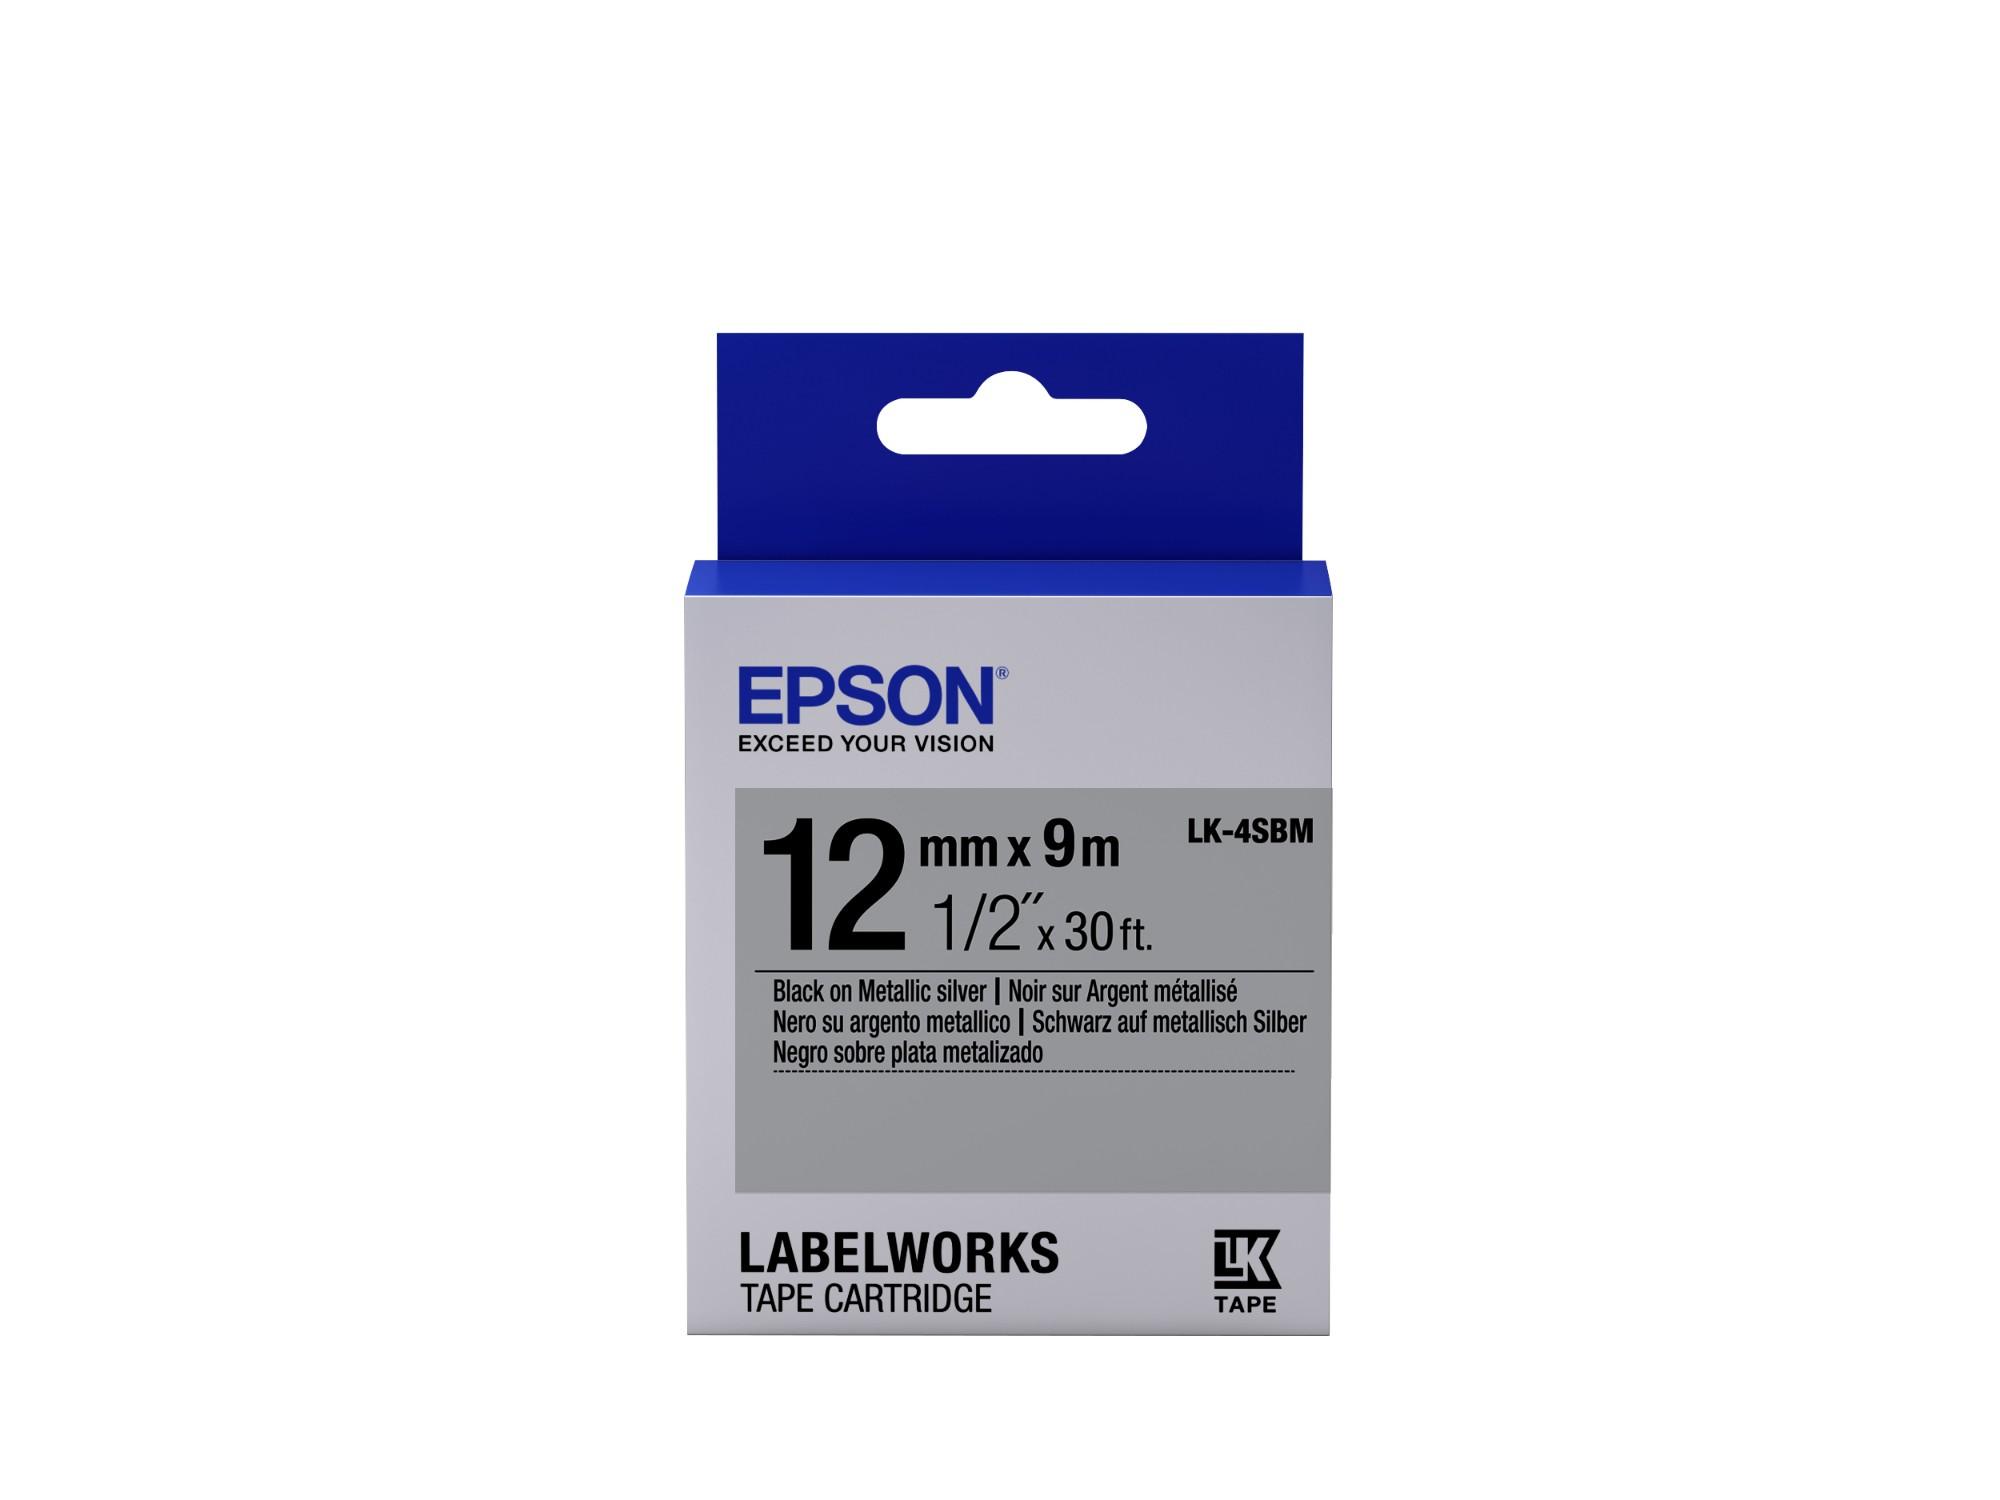 Epson Cinta metálica - LK-4SBM plata/negro metálico 12/9